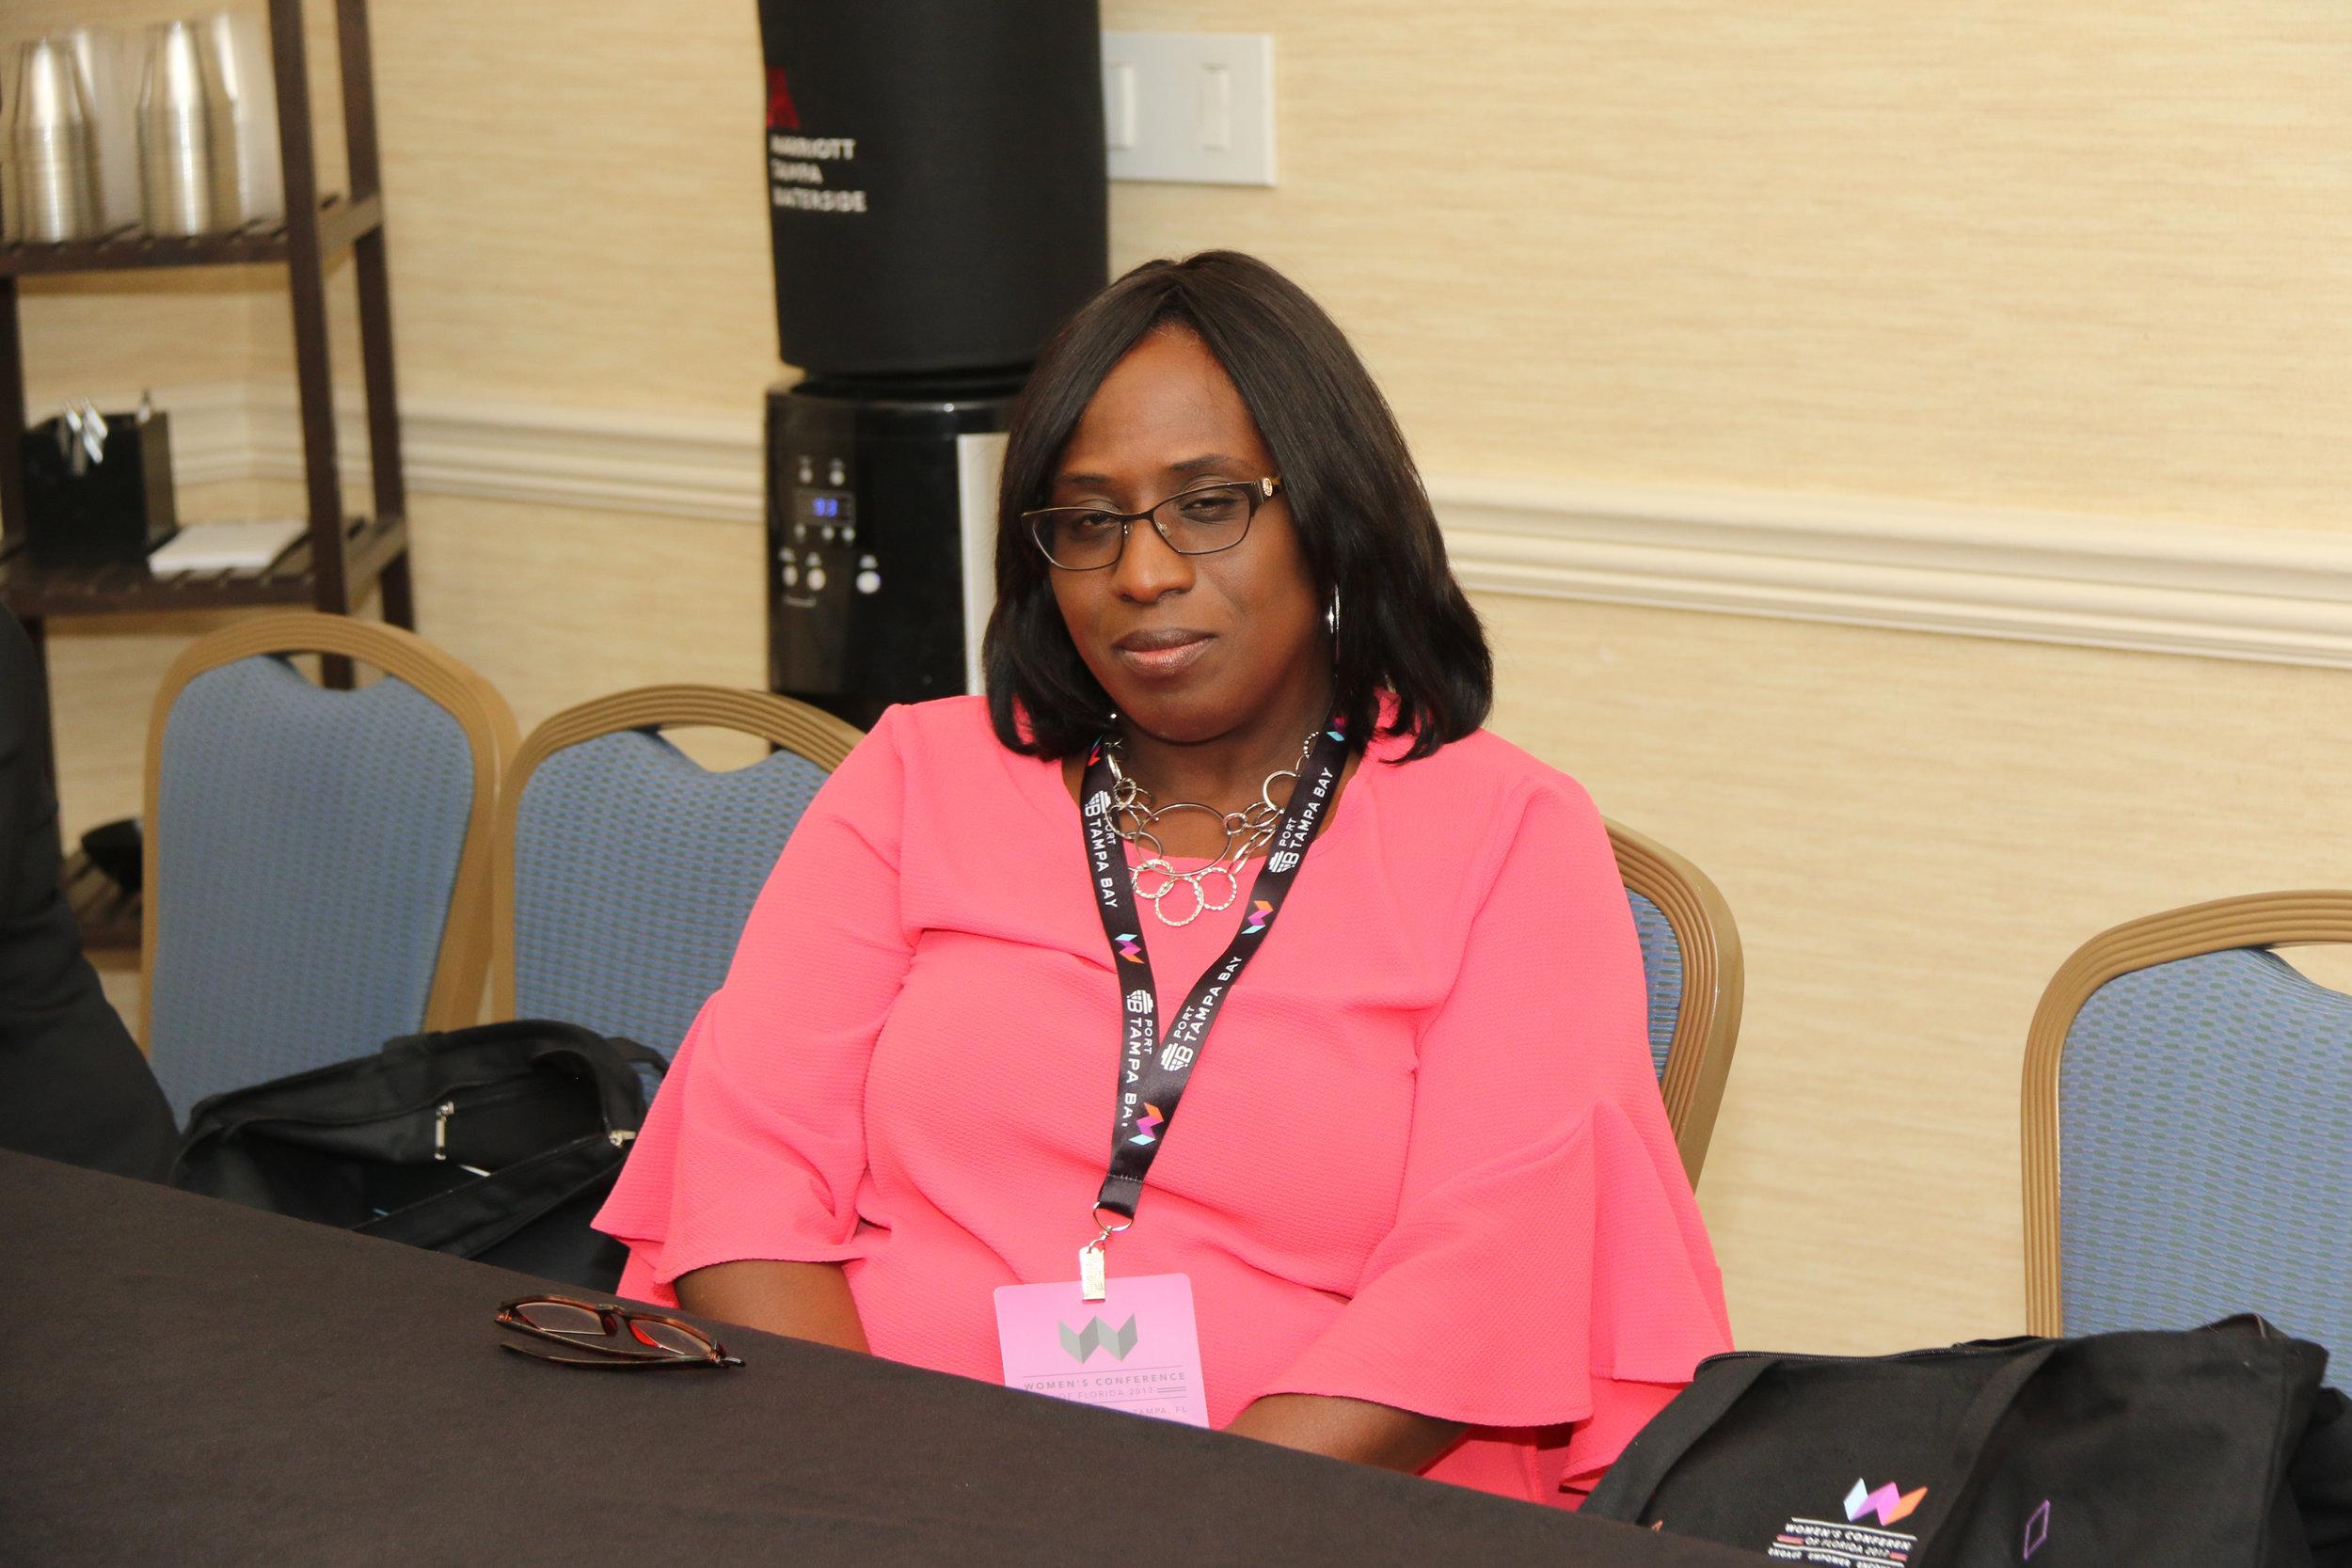 242_WomensConference_10-26-17.jpg